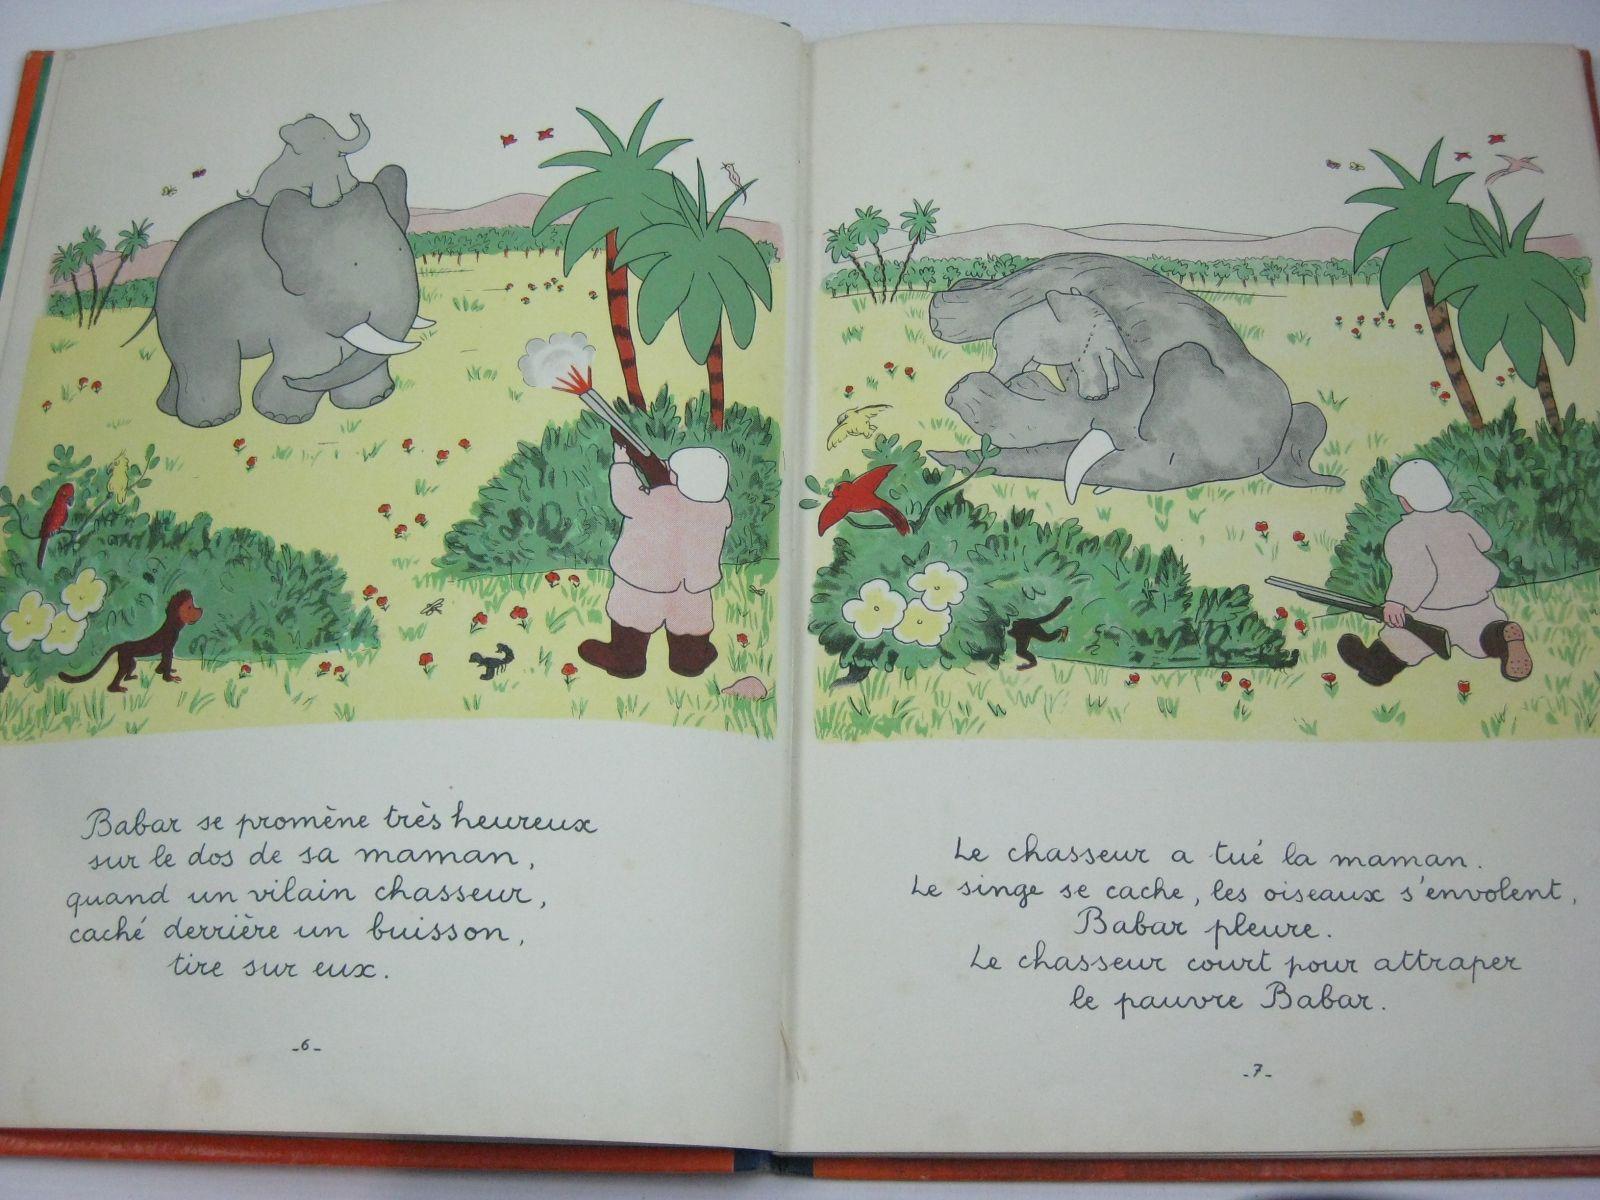 Photo of HISTOIRE DE BABAR LE PETIT ELEPHANT written by De Brunhoff, Jean illustrated by De Brunhoff, Jean published by Editions Du Jardin Des Modes (STOCK CODE: 1314648)  for sale by Stella & Rose's Books